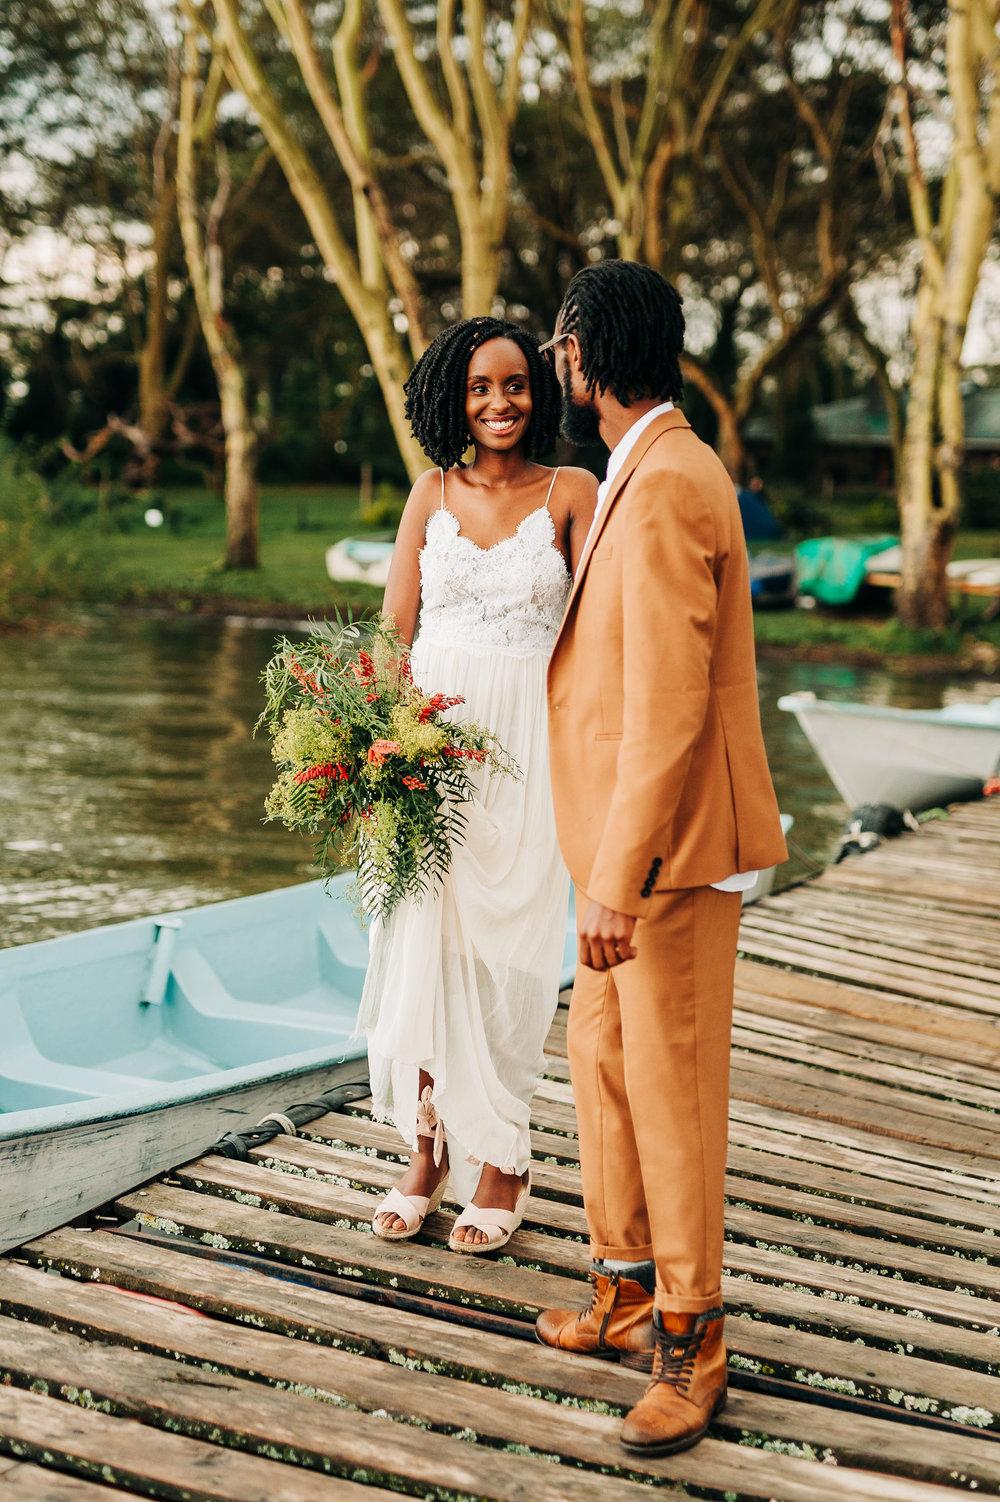 Anna-Hari-Photography-Destination-Wedding-Photographer-Kenya-74.jpg